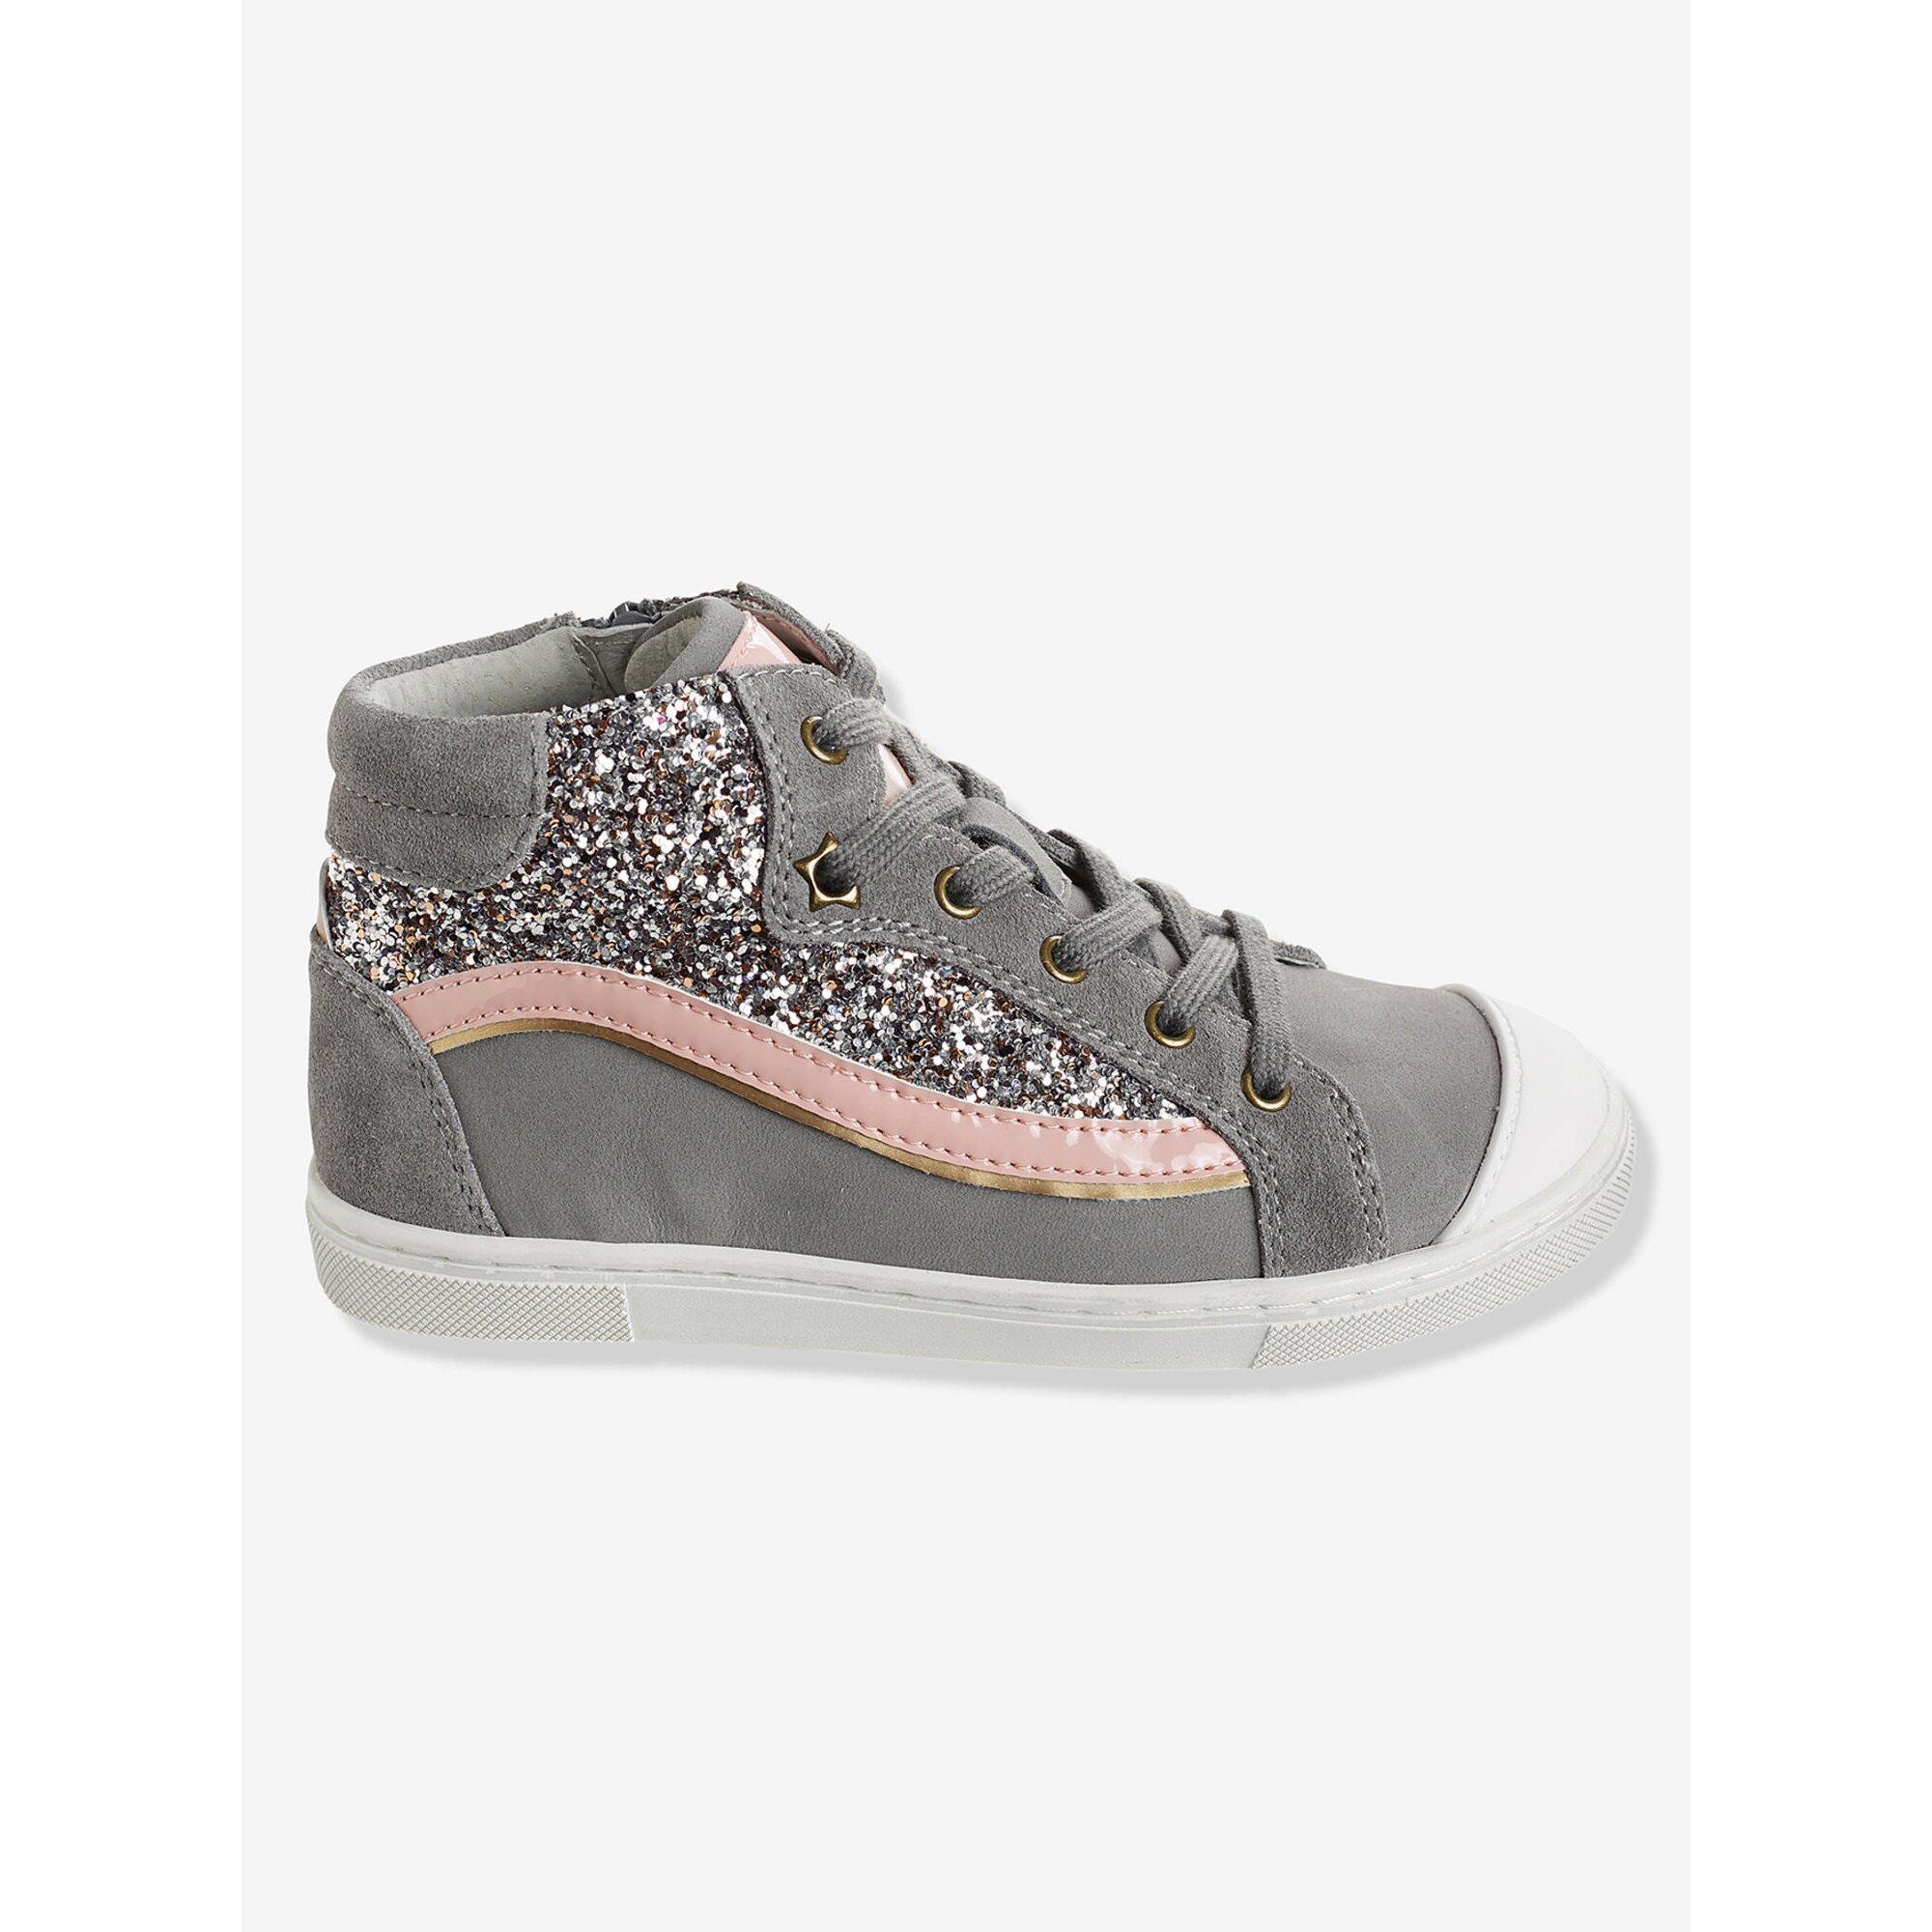 vertbaudet-sneakers-fur-madchen-schnurung-und-zipper, 38.24 EUR @ babywalz-de